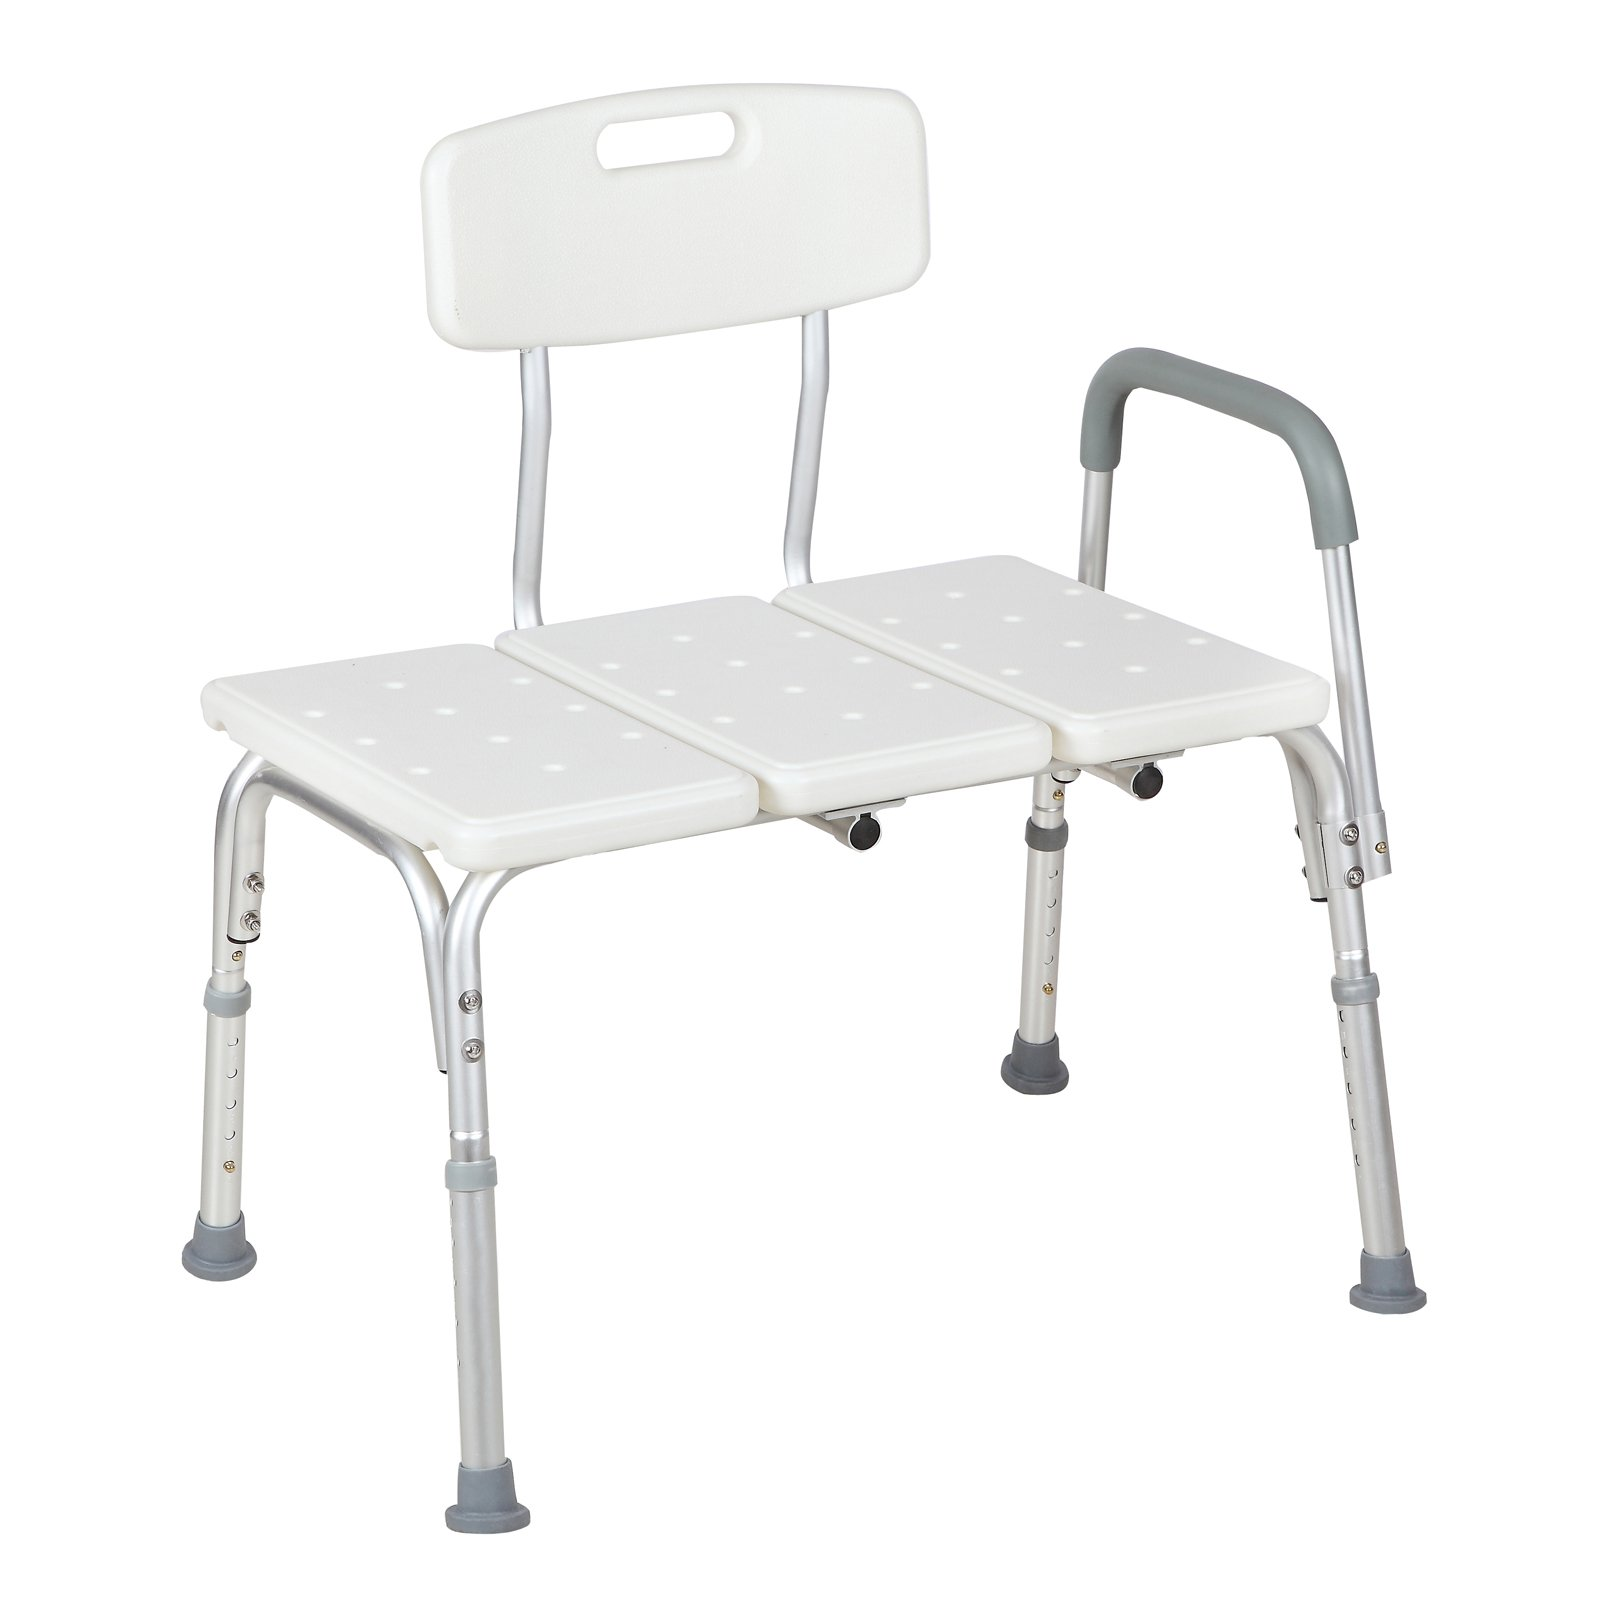 Uenjoy Bath Shower Chair Medical Transfer Bench Tub Transfer Bench Movable Seat